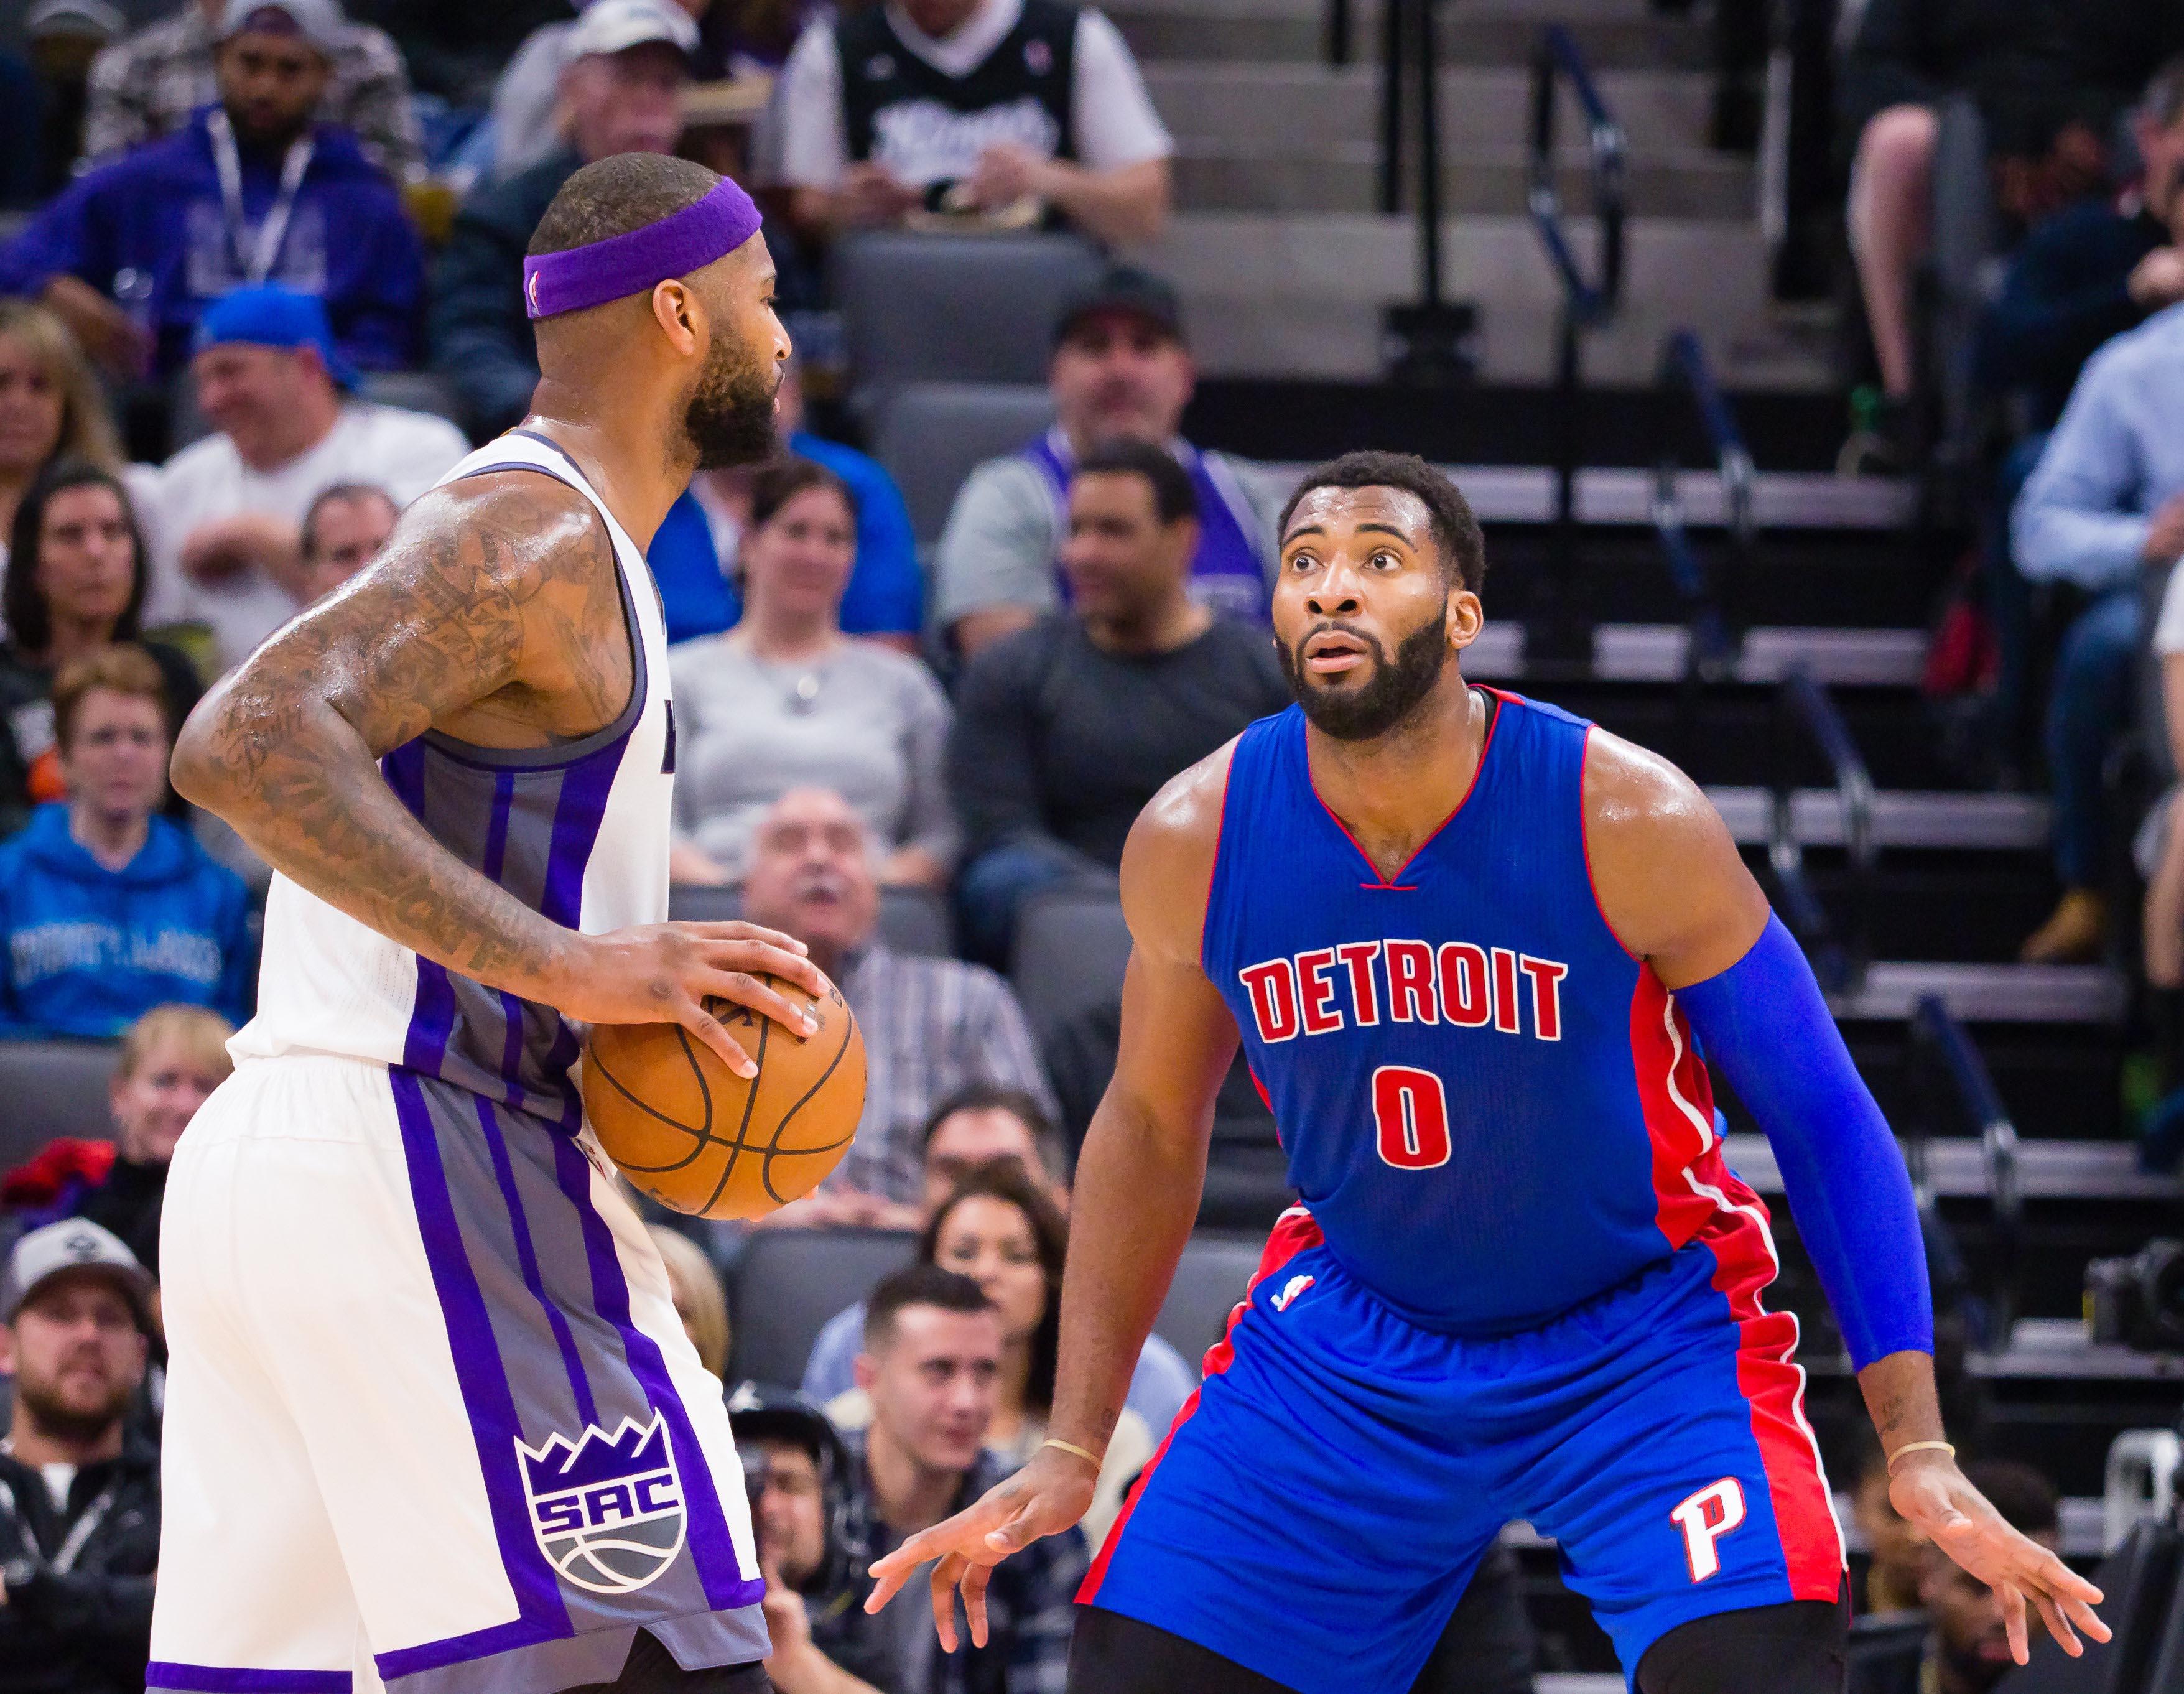 NBA: Detroit Pistons at Sacramento Kings